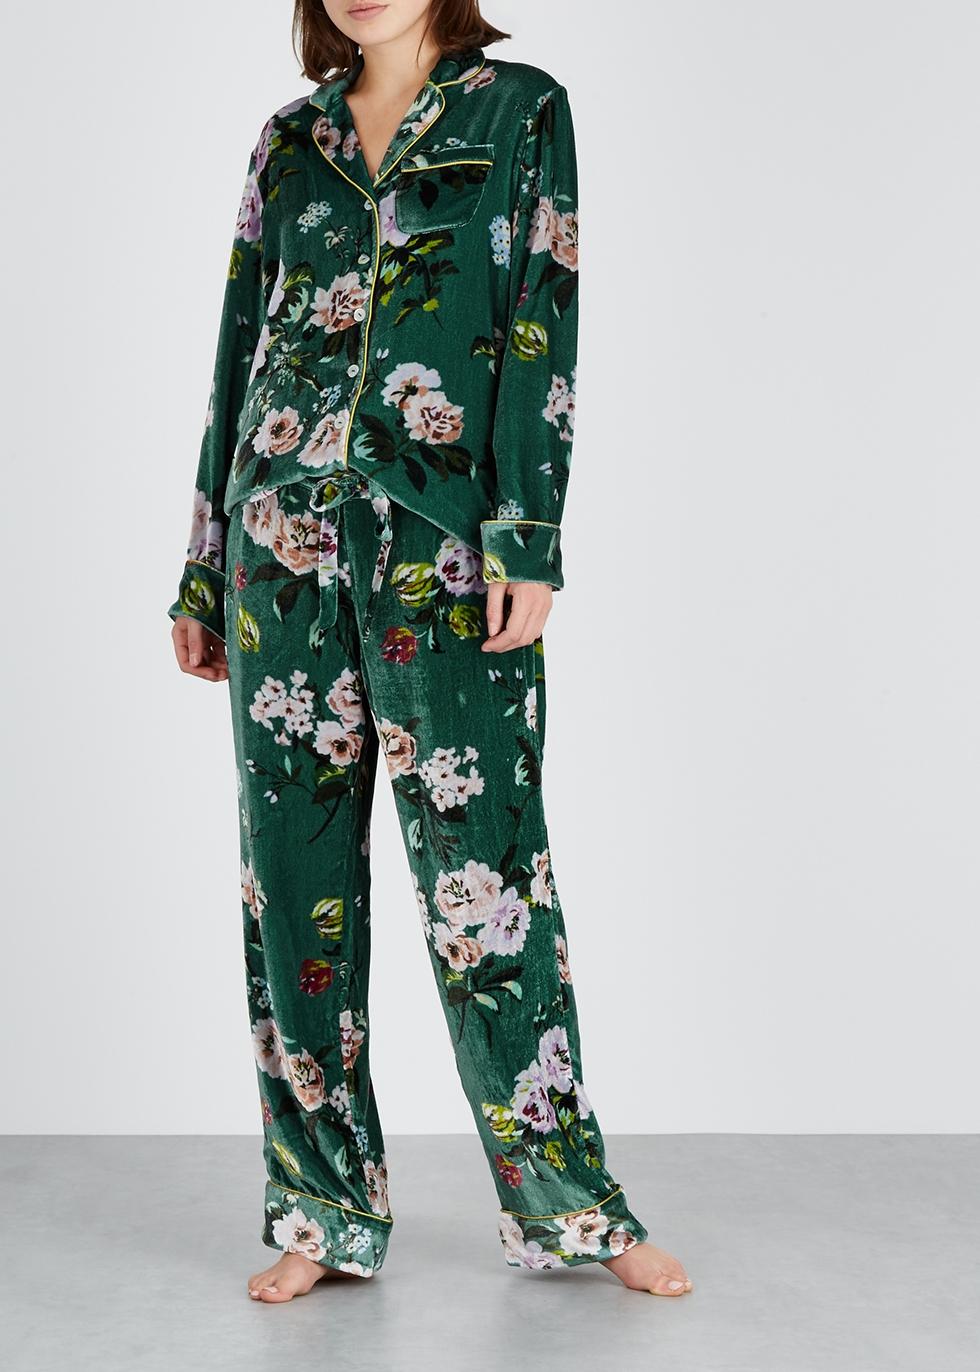 9ab9f1377b6 Designer Sleepwear - Luxury Lingerie - Harvey Nichols